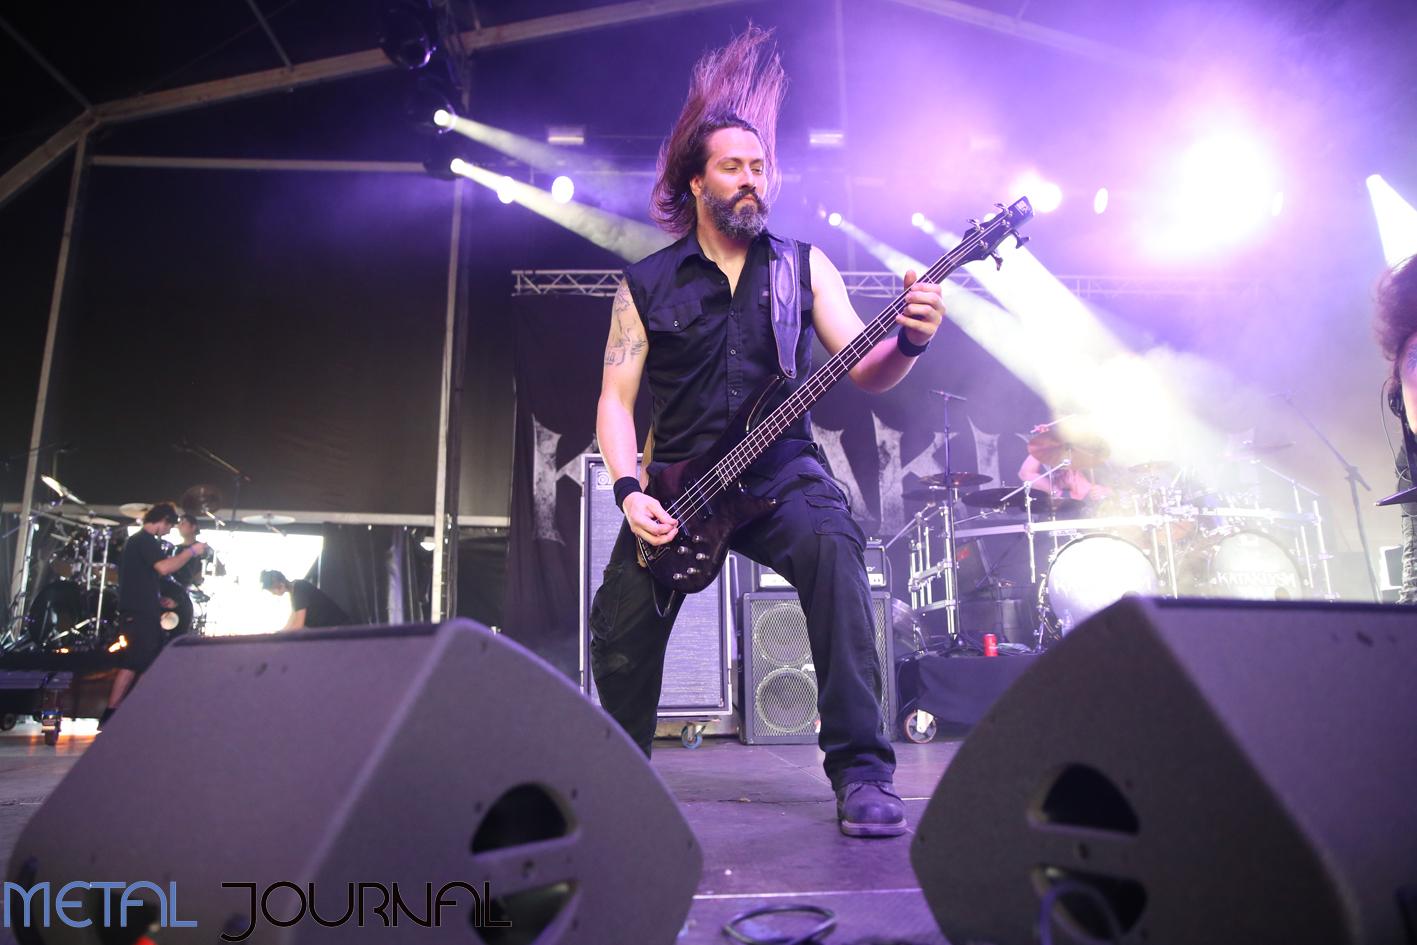 kataklysm rock fest 18 - metal journal pic 3